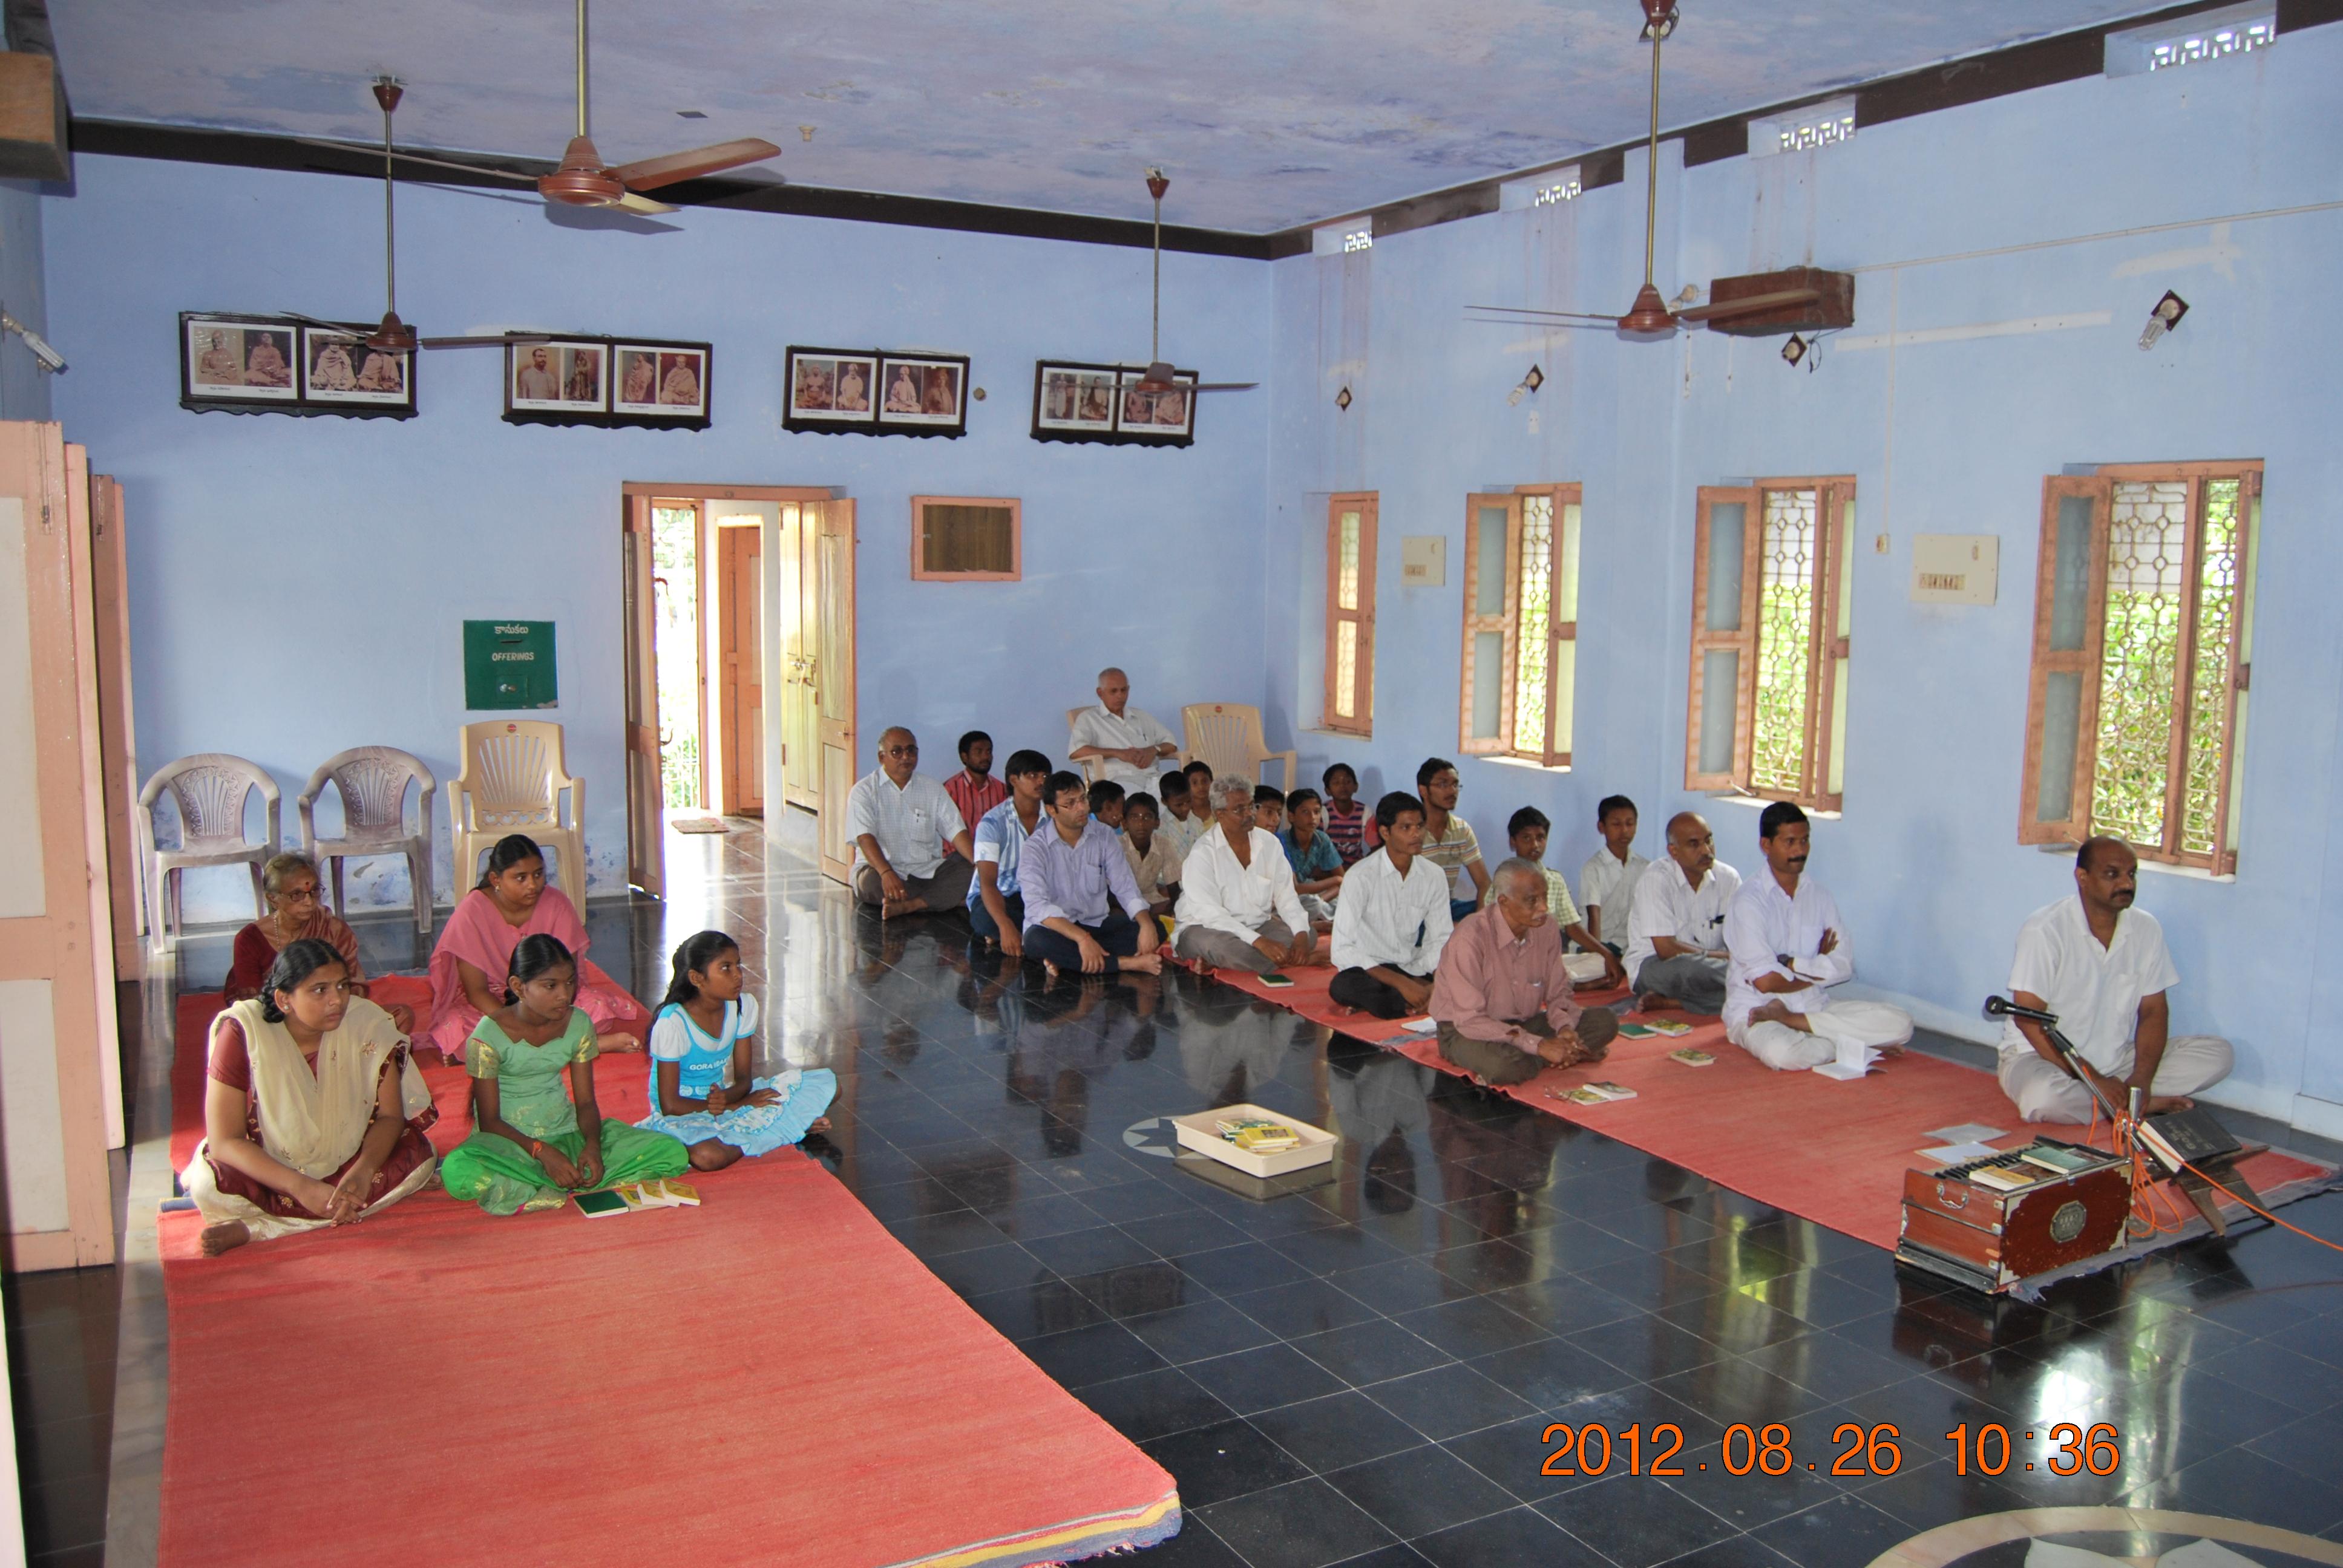 Gathering of devotees 26 Aug, 2012